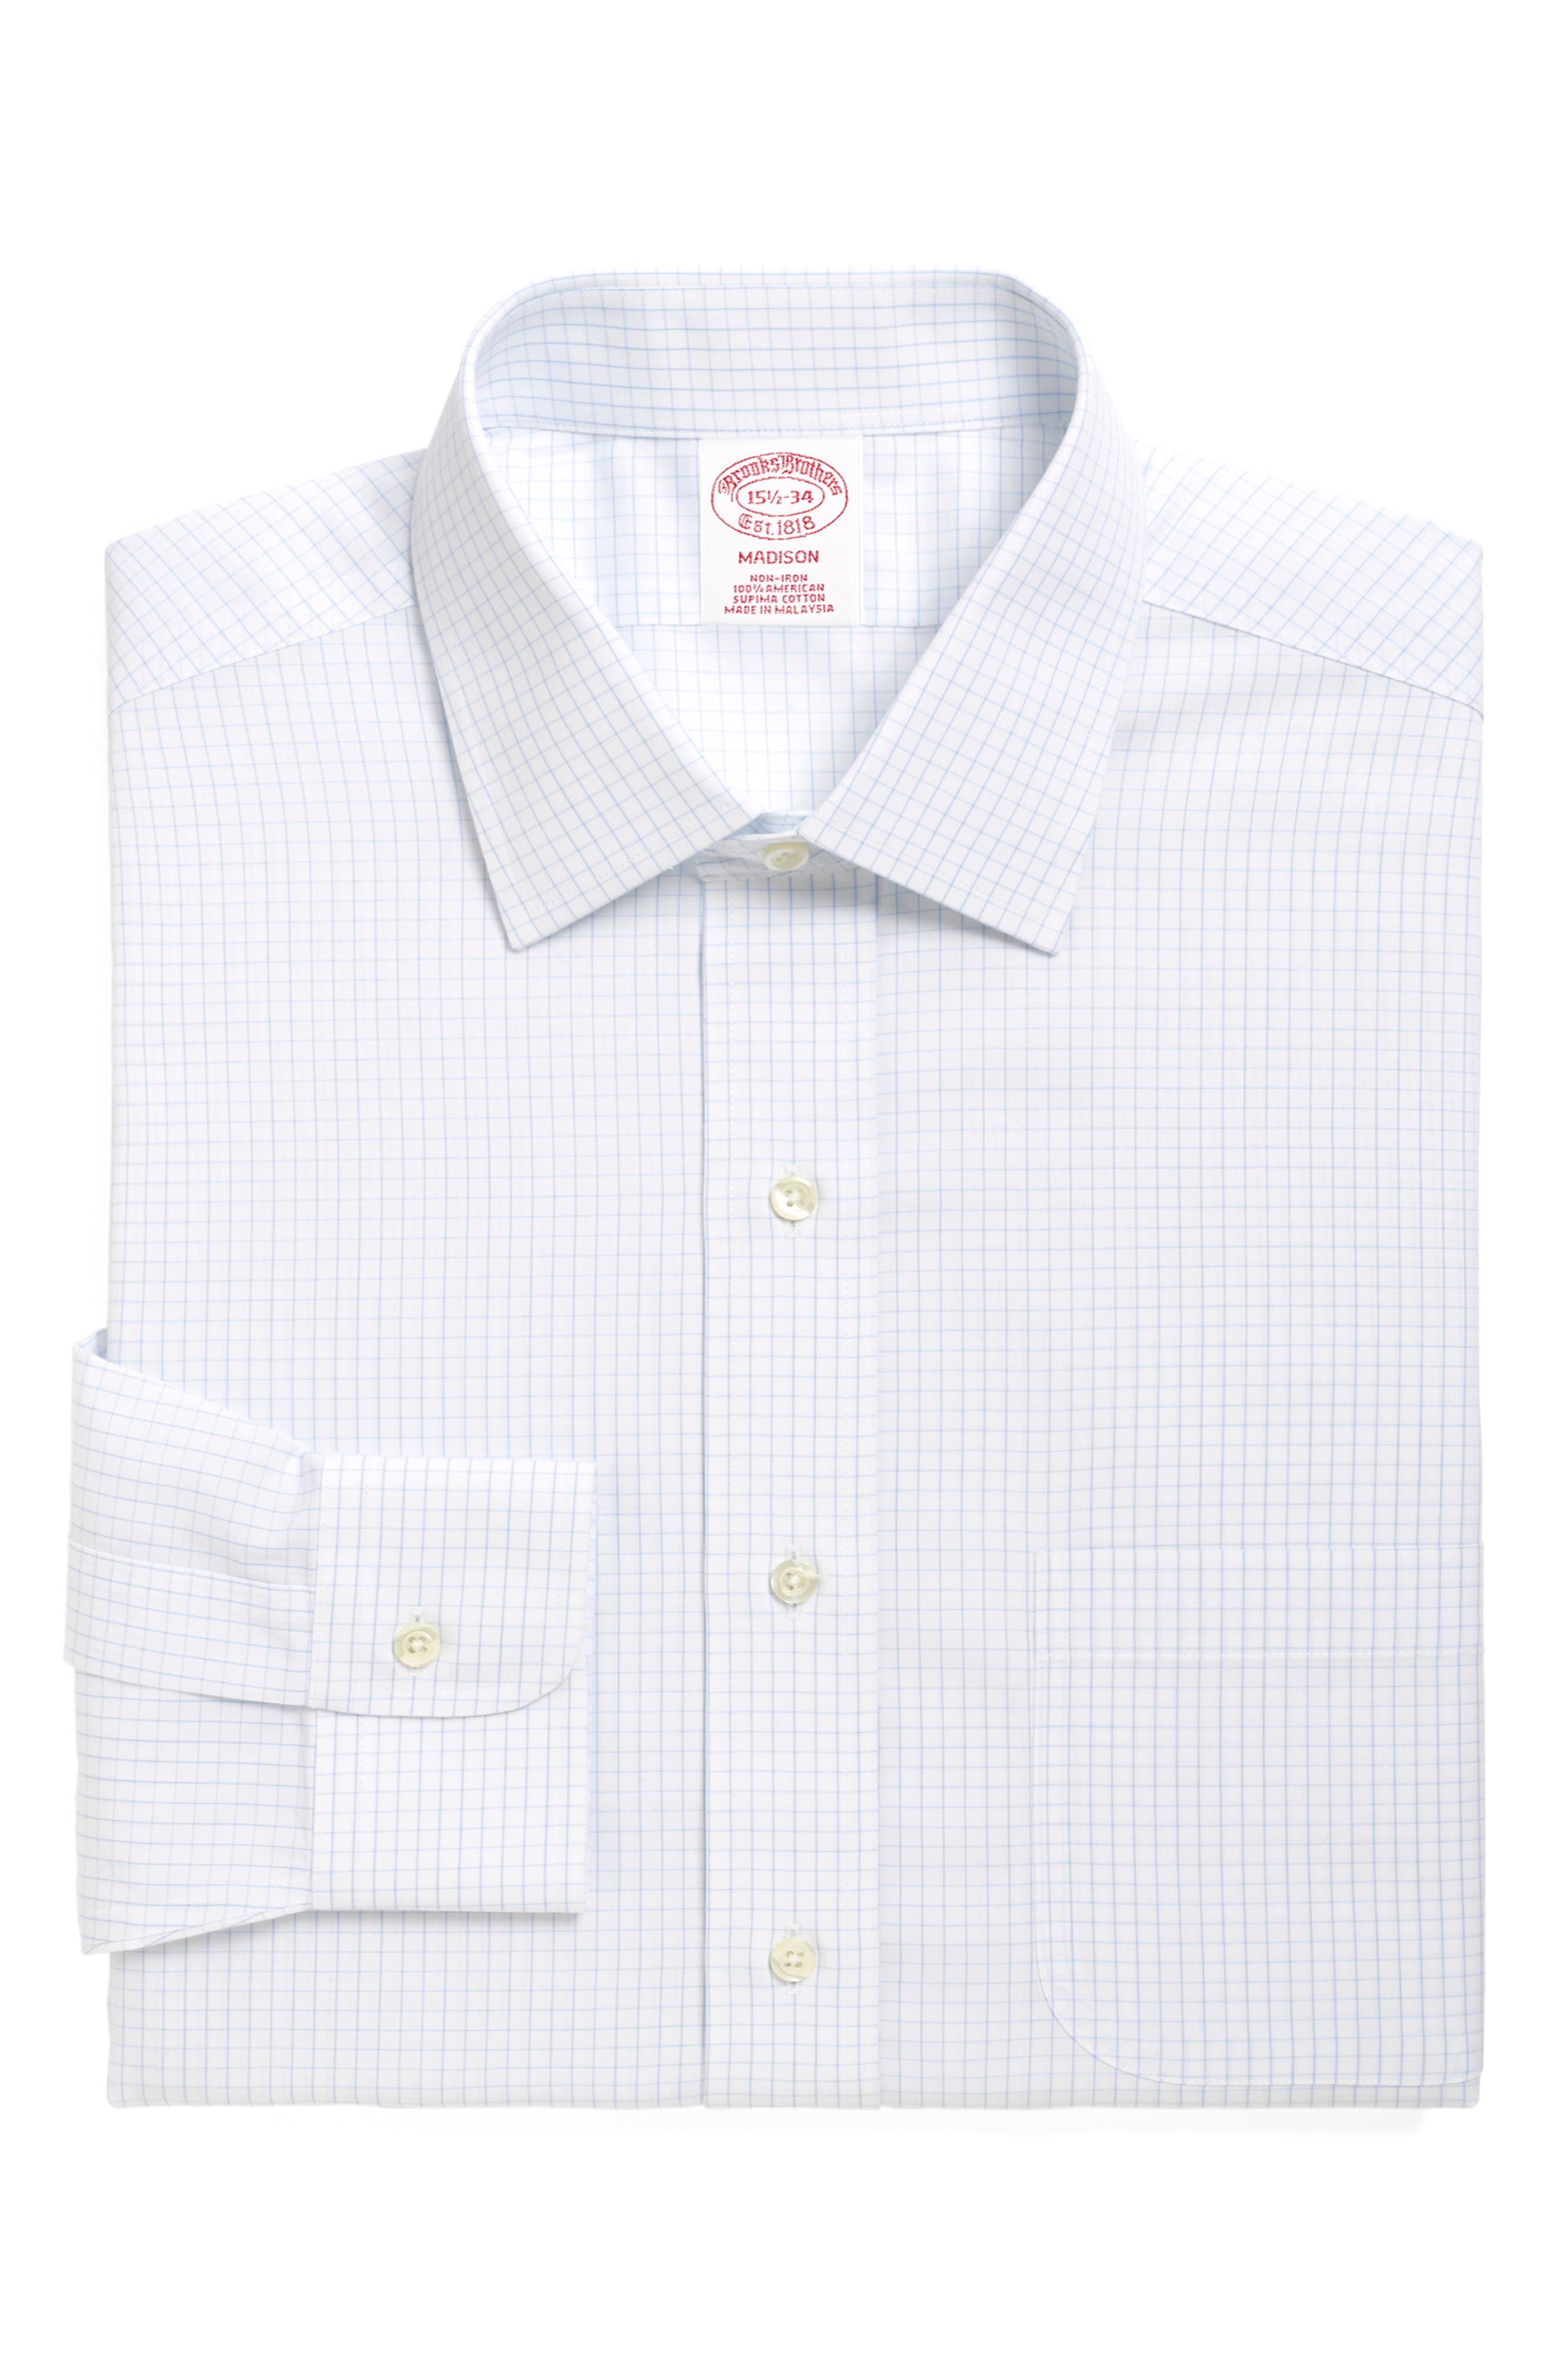 Classic Fit Check Dress Shirt,                             Main thumbnail 1, color,                             LIGHT/ PASTEL BLUE